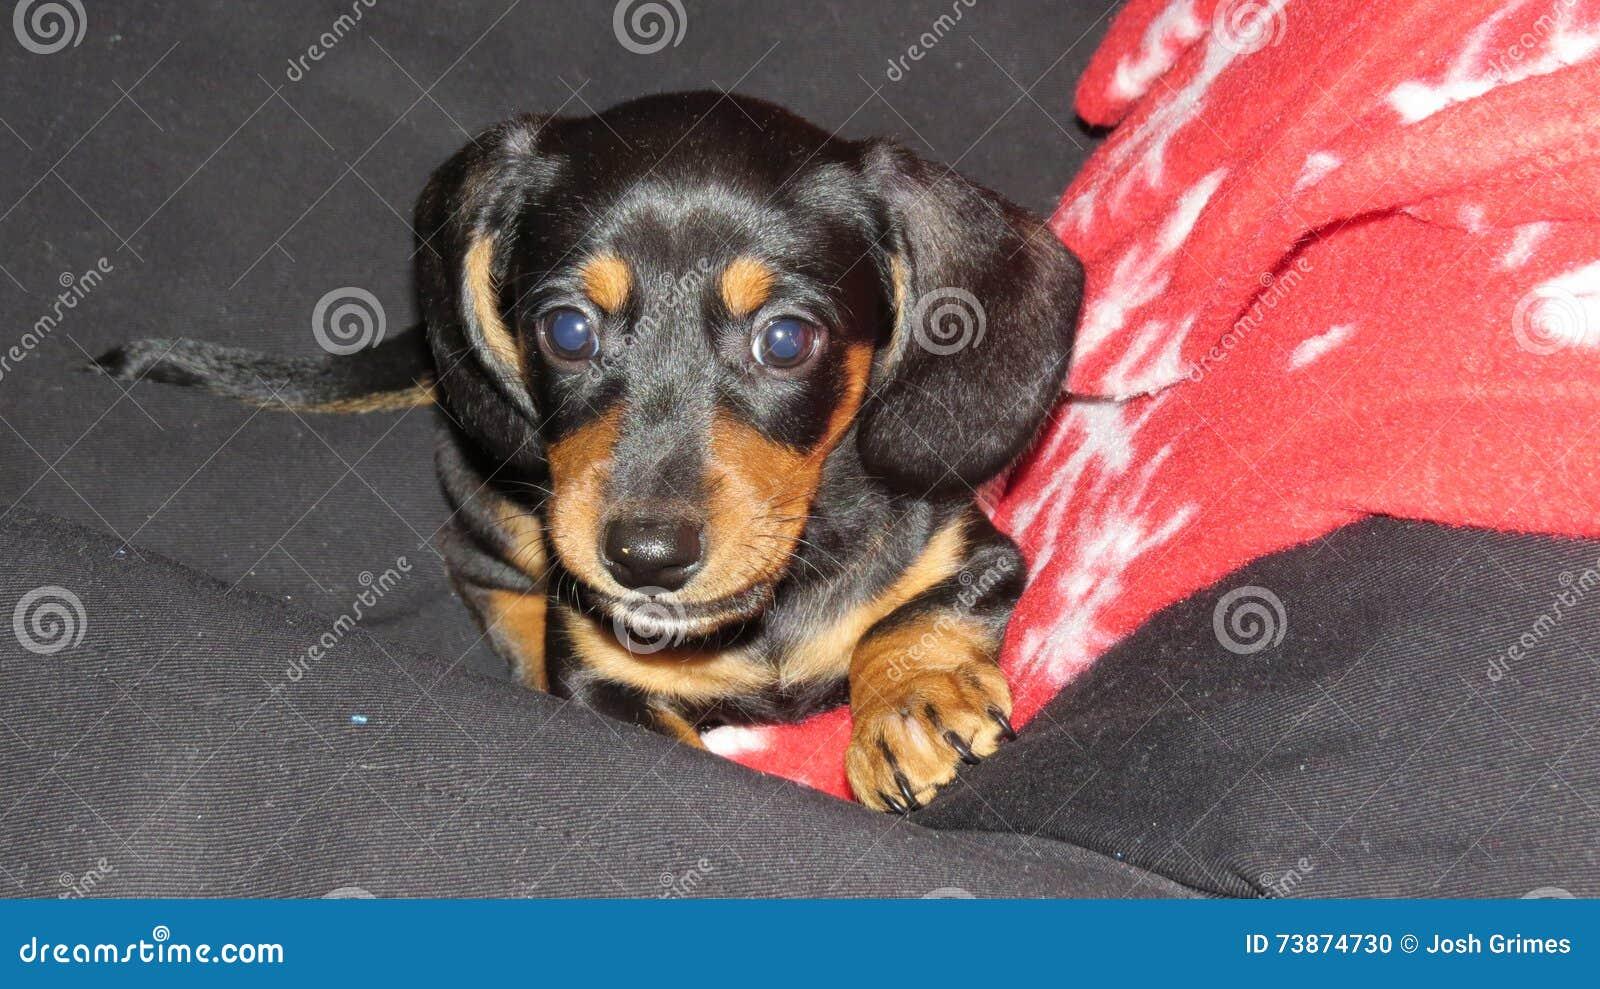 Cute Dachshund Puppy Stock Photo Image Of Dachshund 73874730